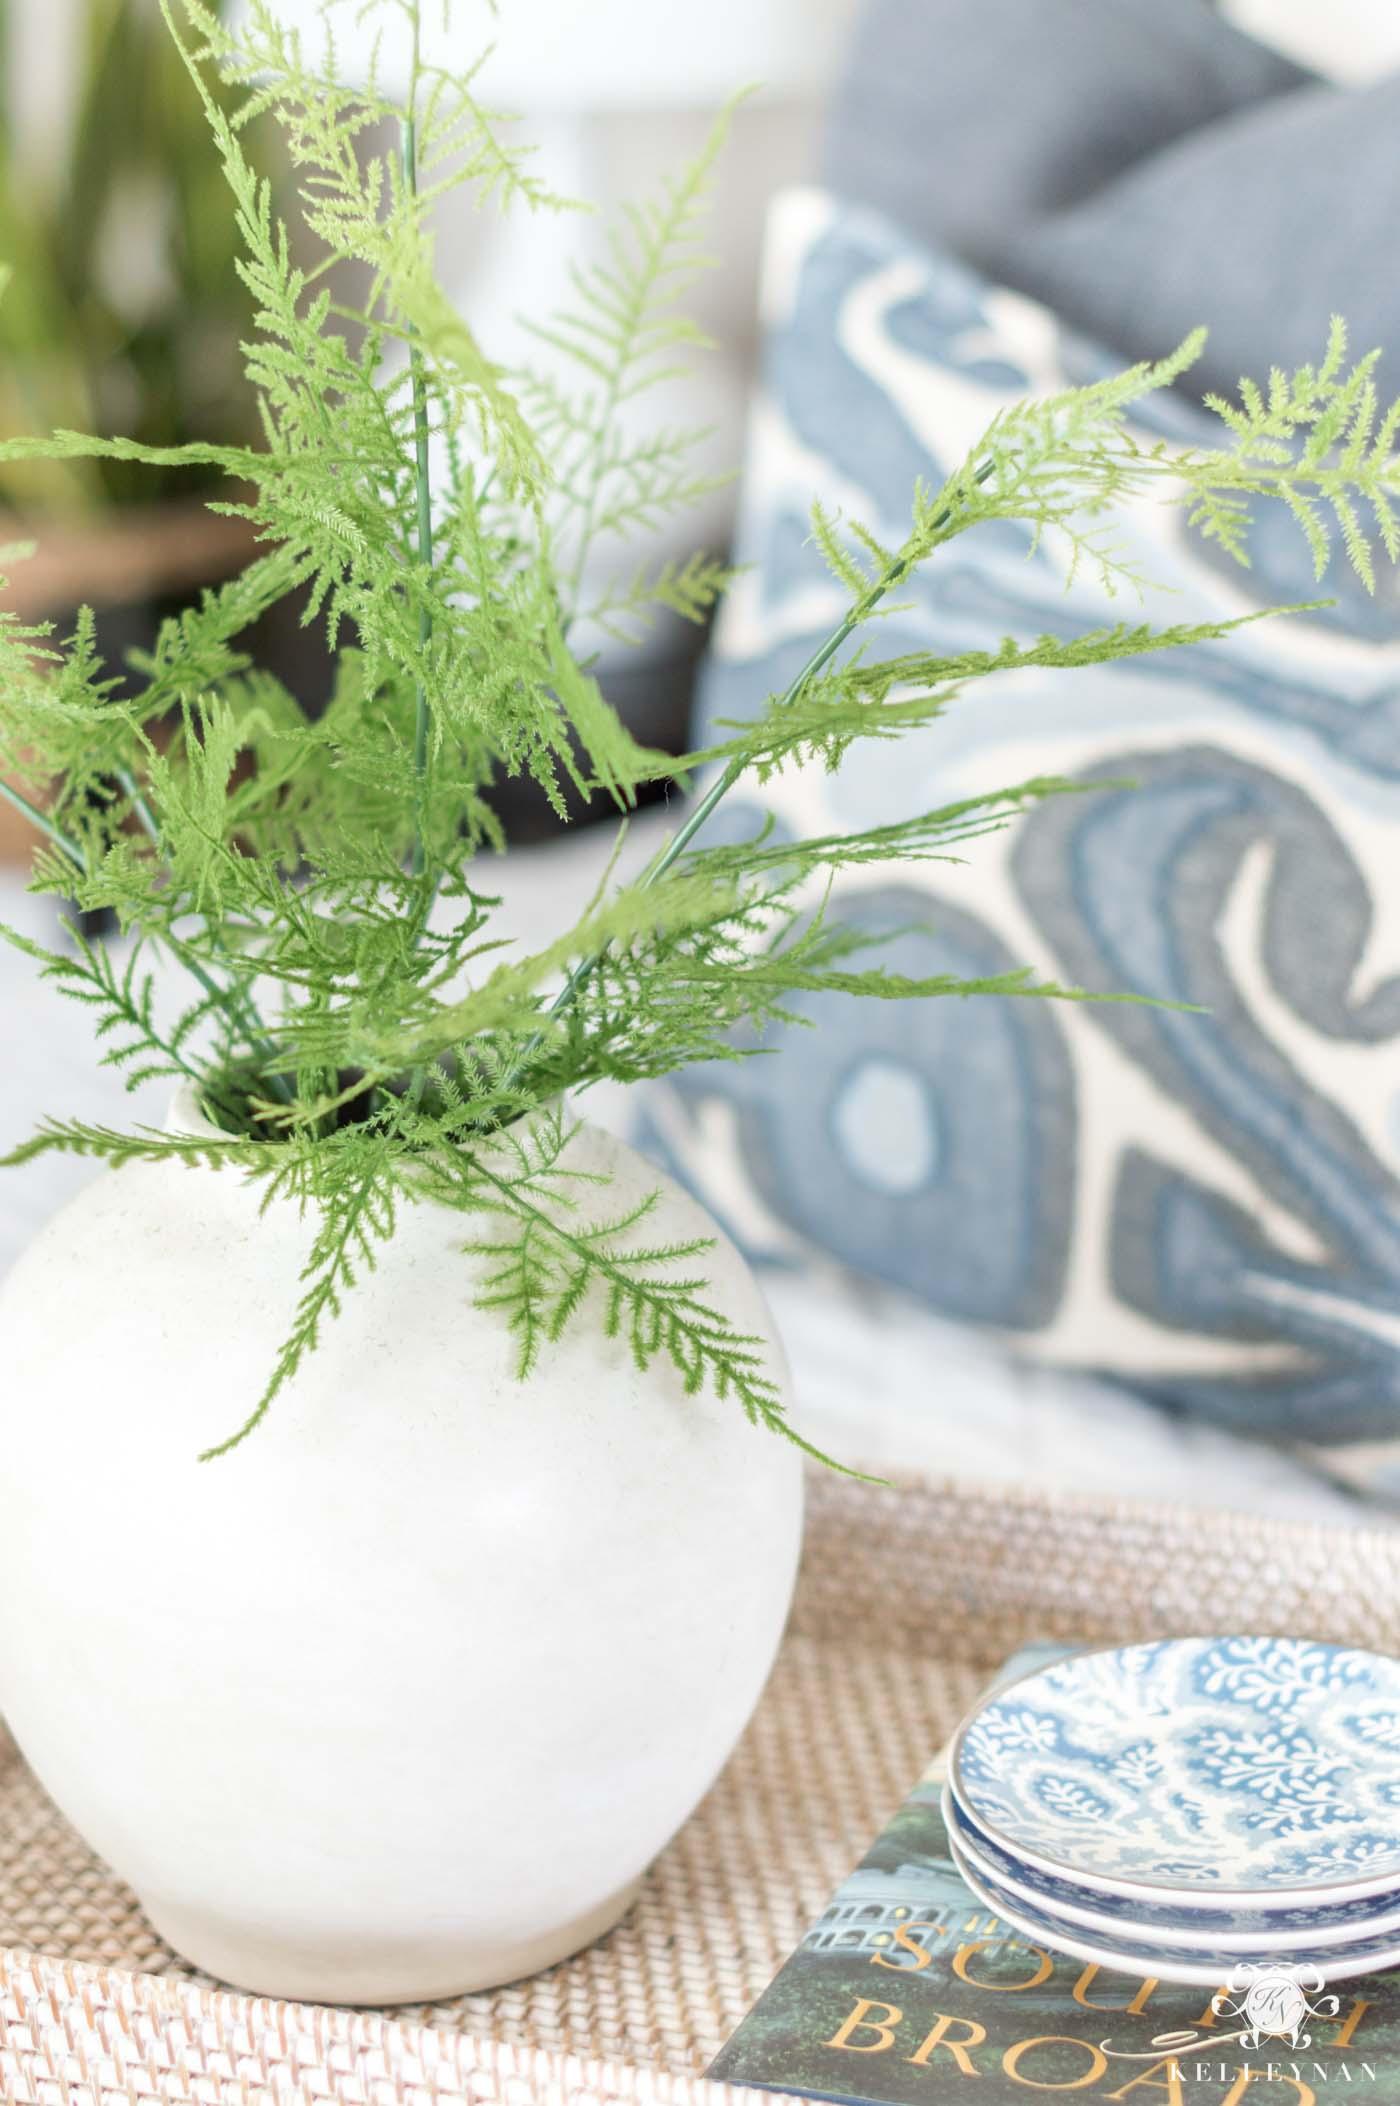 Best faux florals - a vase of asparagus fern stems